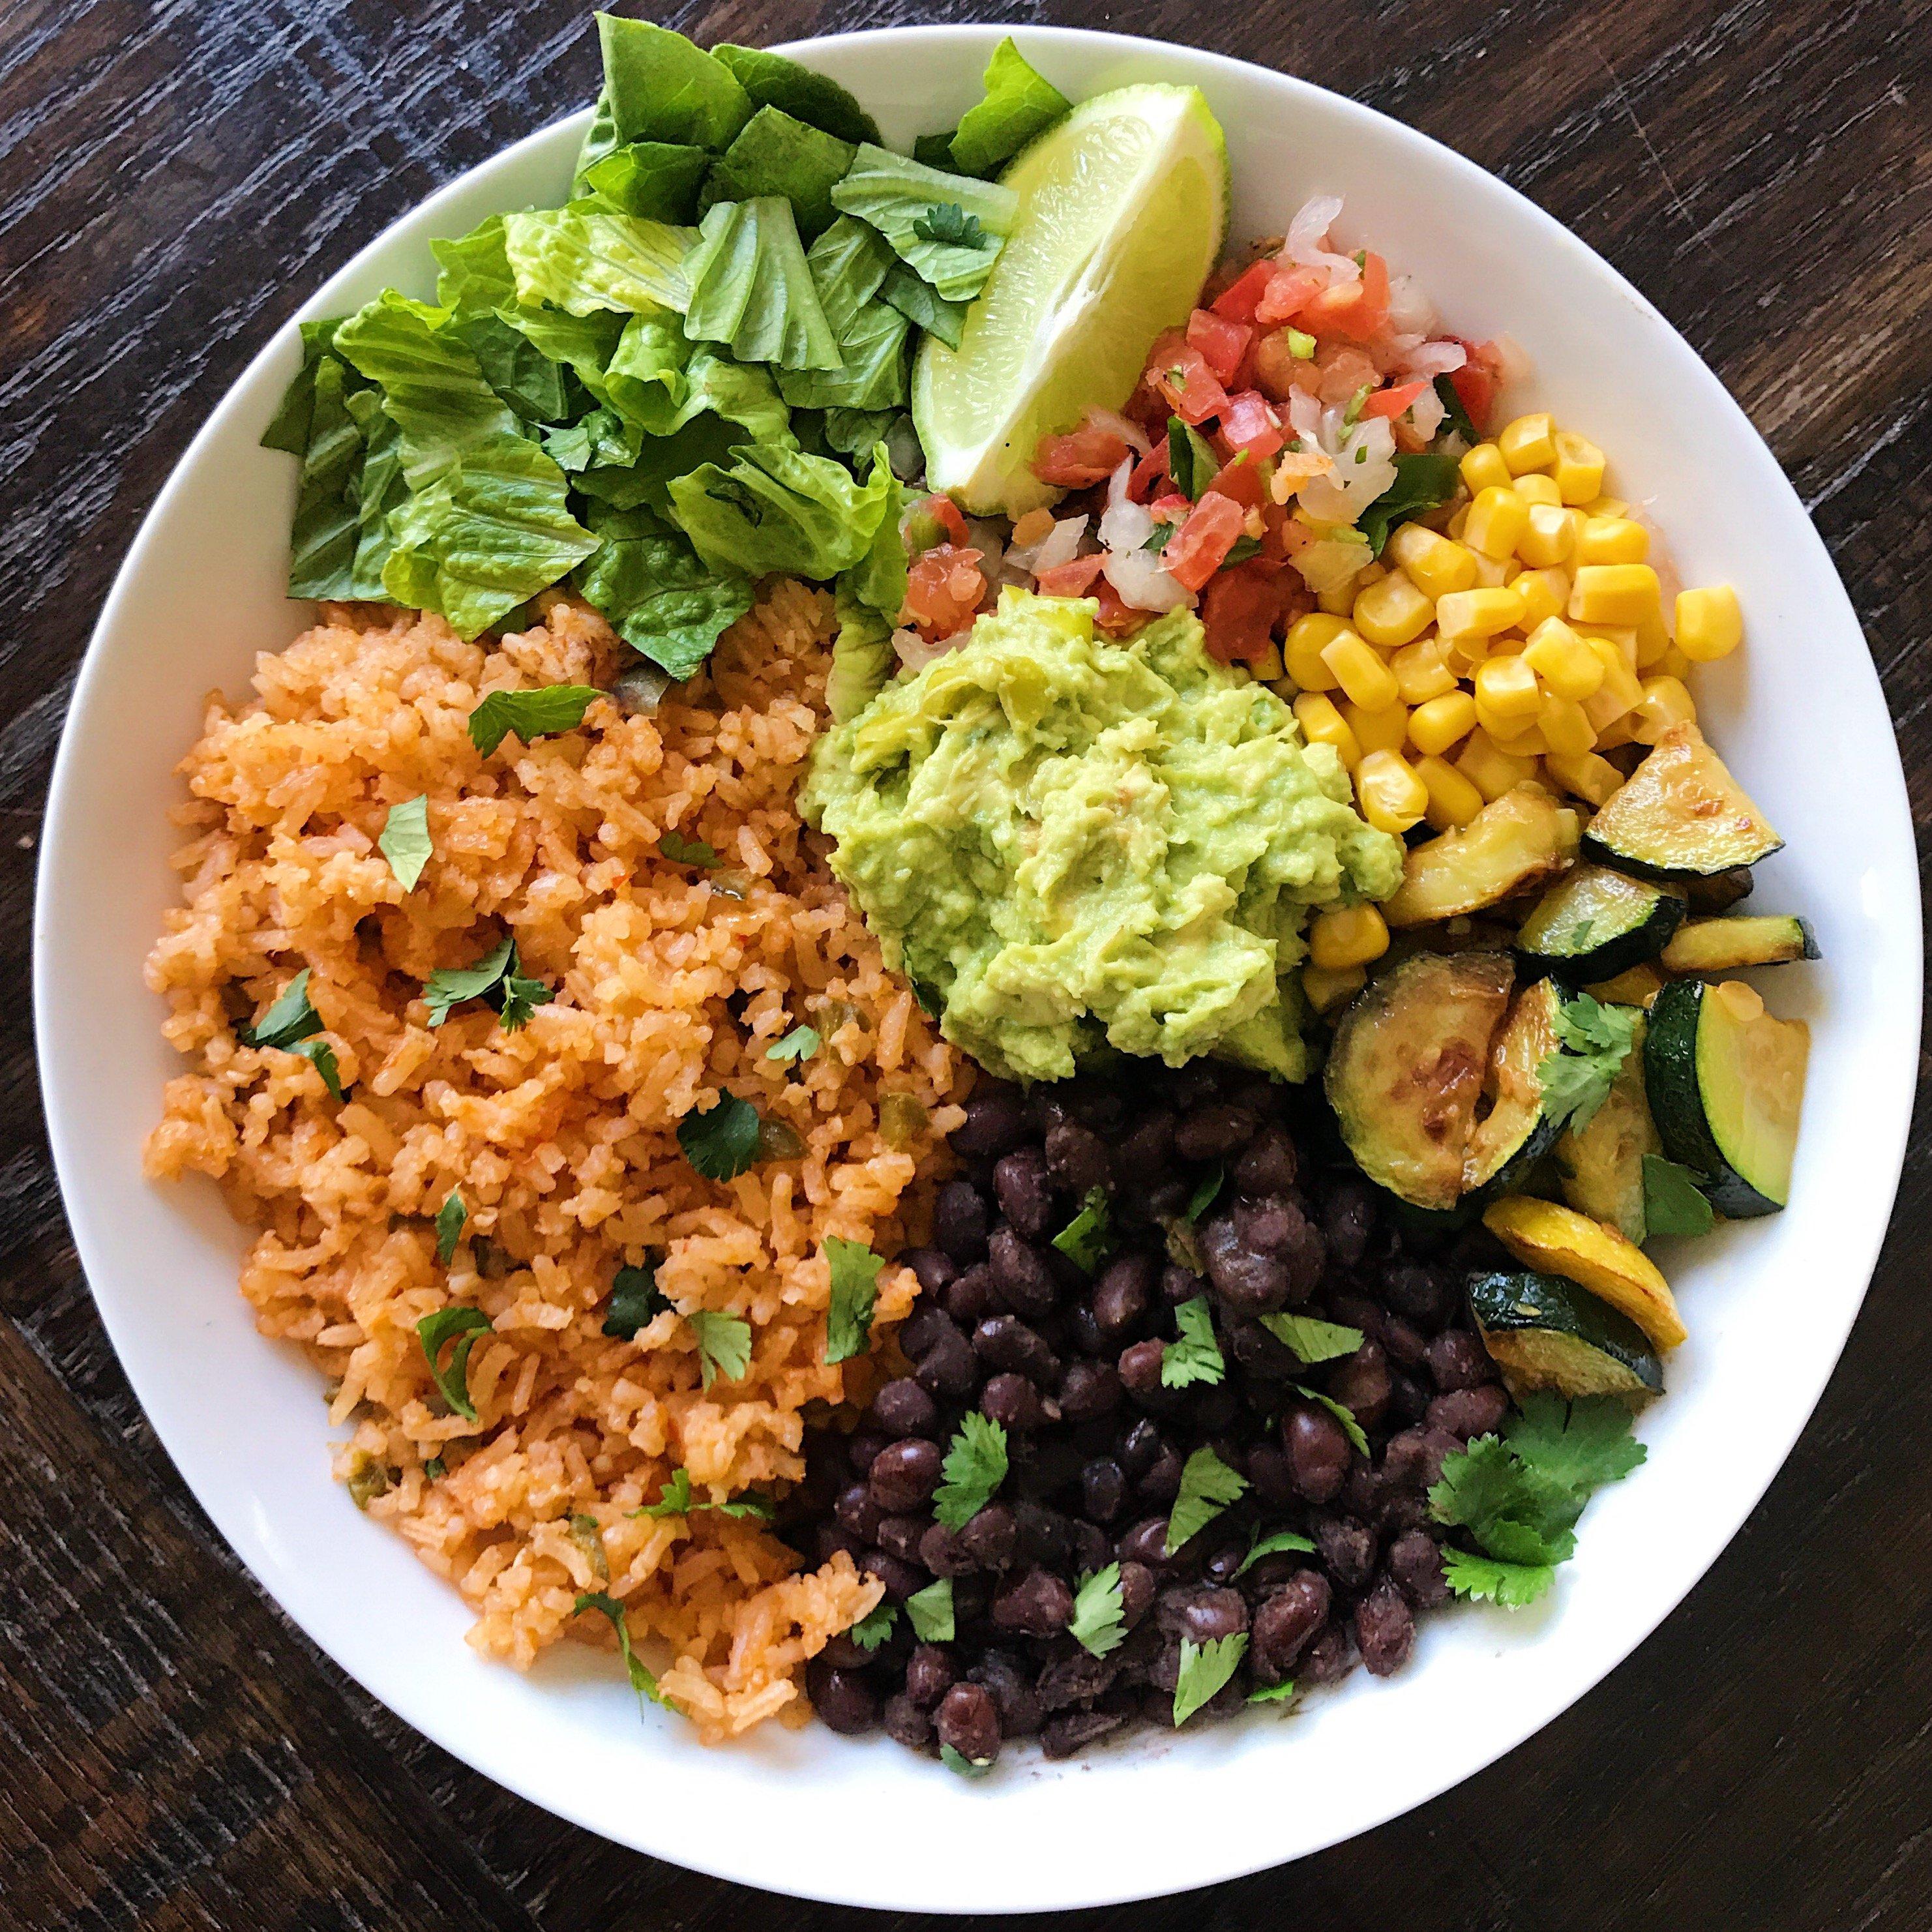 mexican rice black beans gluten free #glutenfreerecipes www.healthygffamilycom.